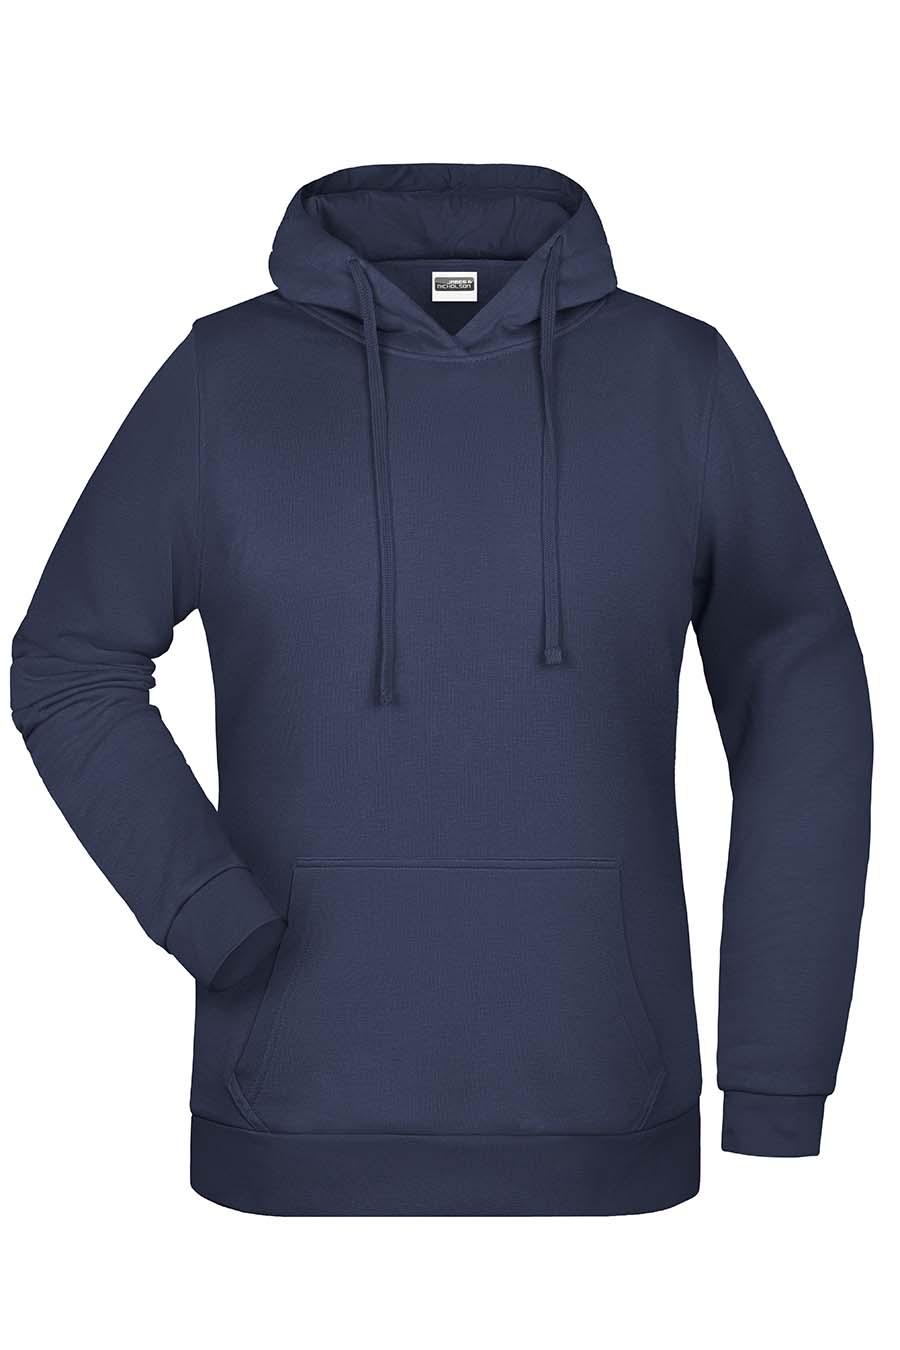 Sweat-shirt capuche femme - 20-1494-11